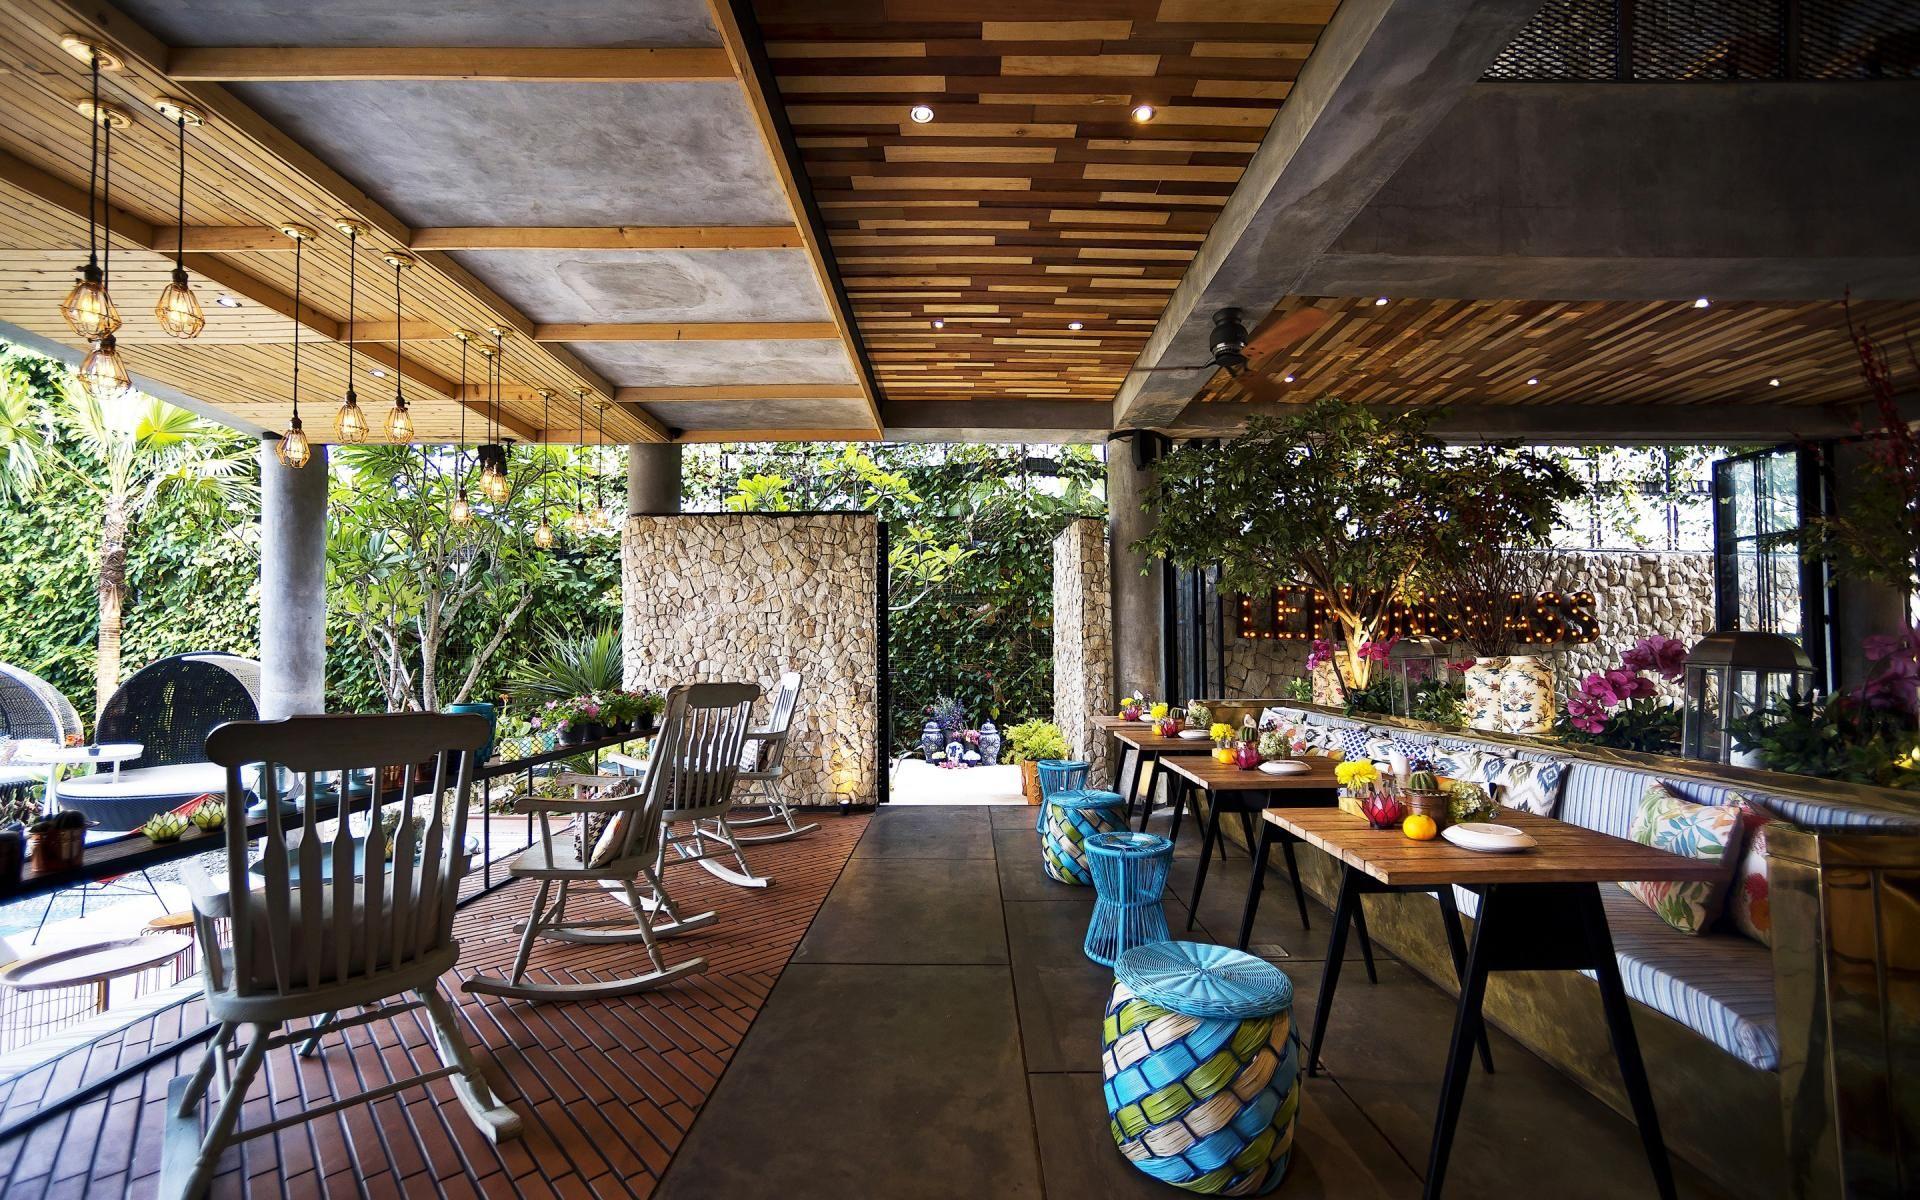 LEMONGRASS Tropical architecture, Resort interior